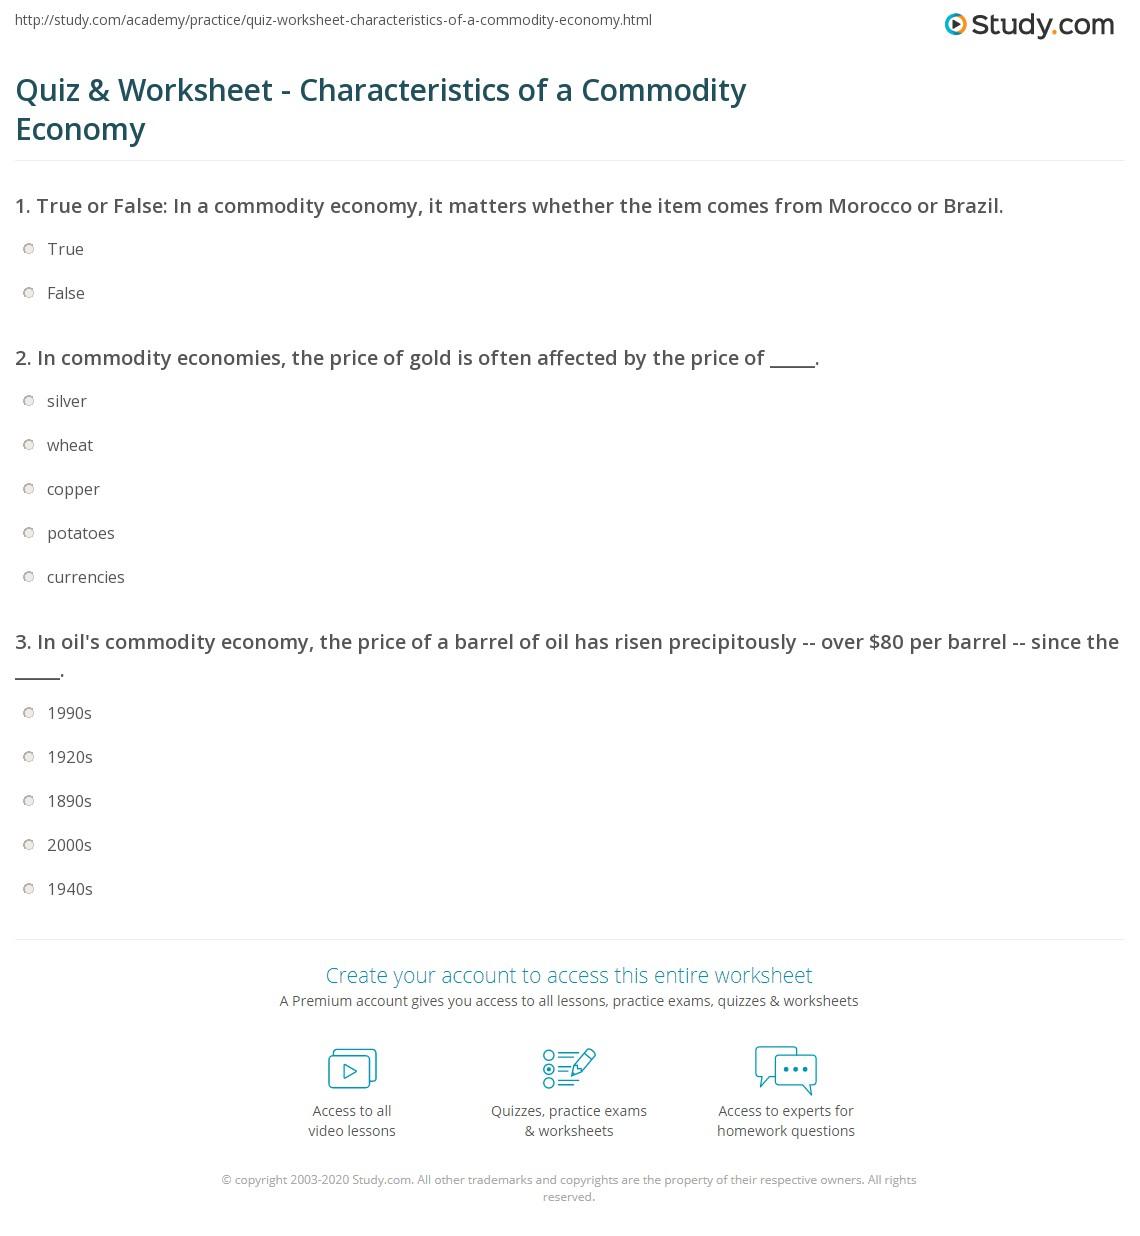 Commodity Economics Definition